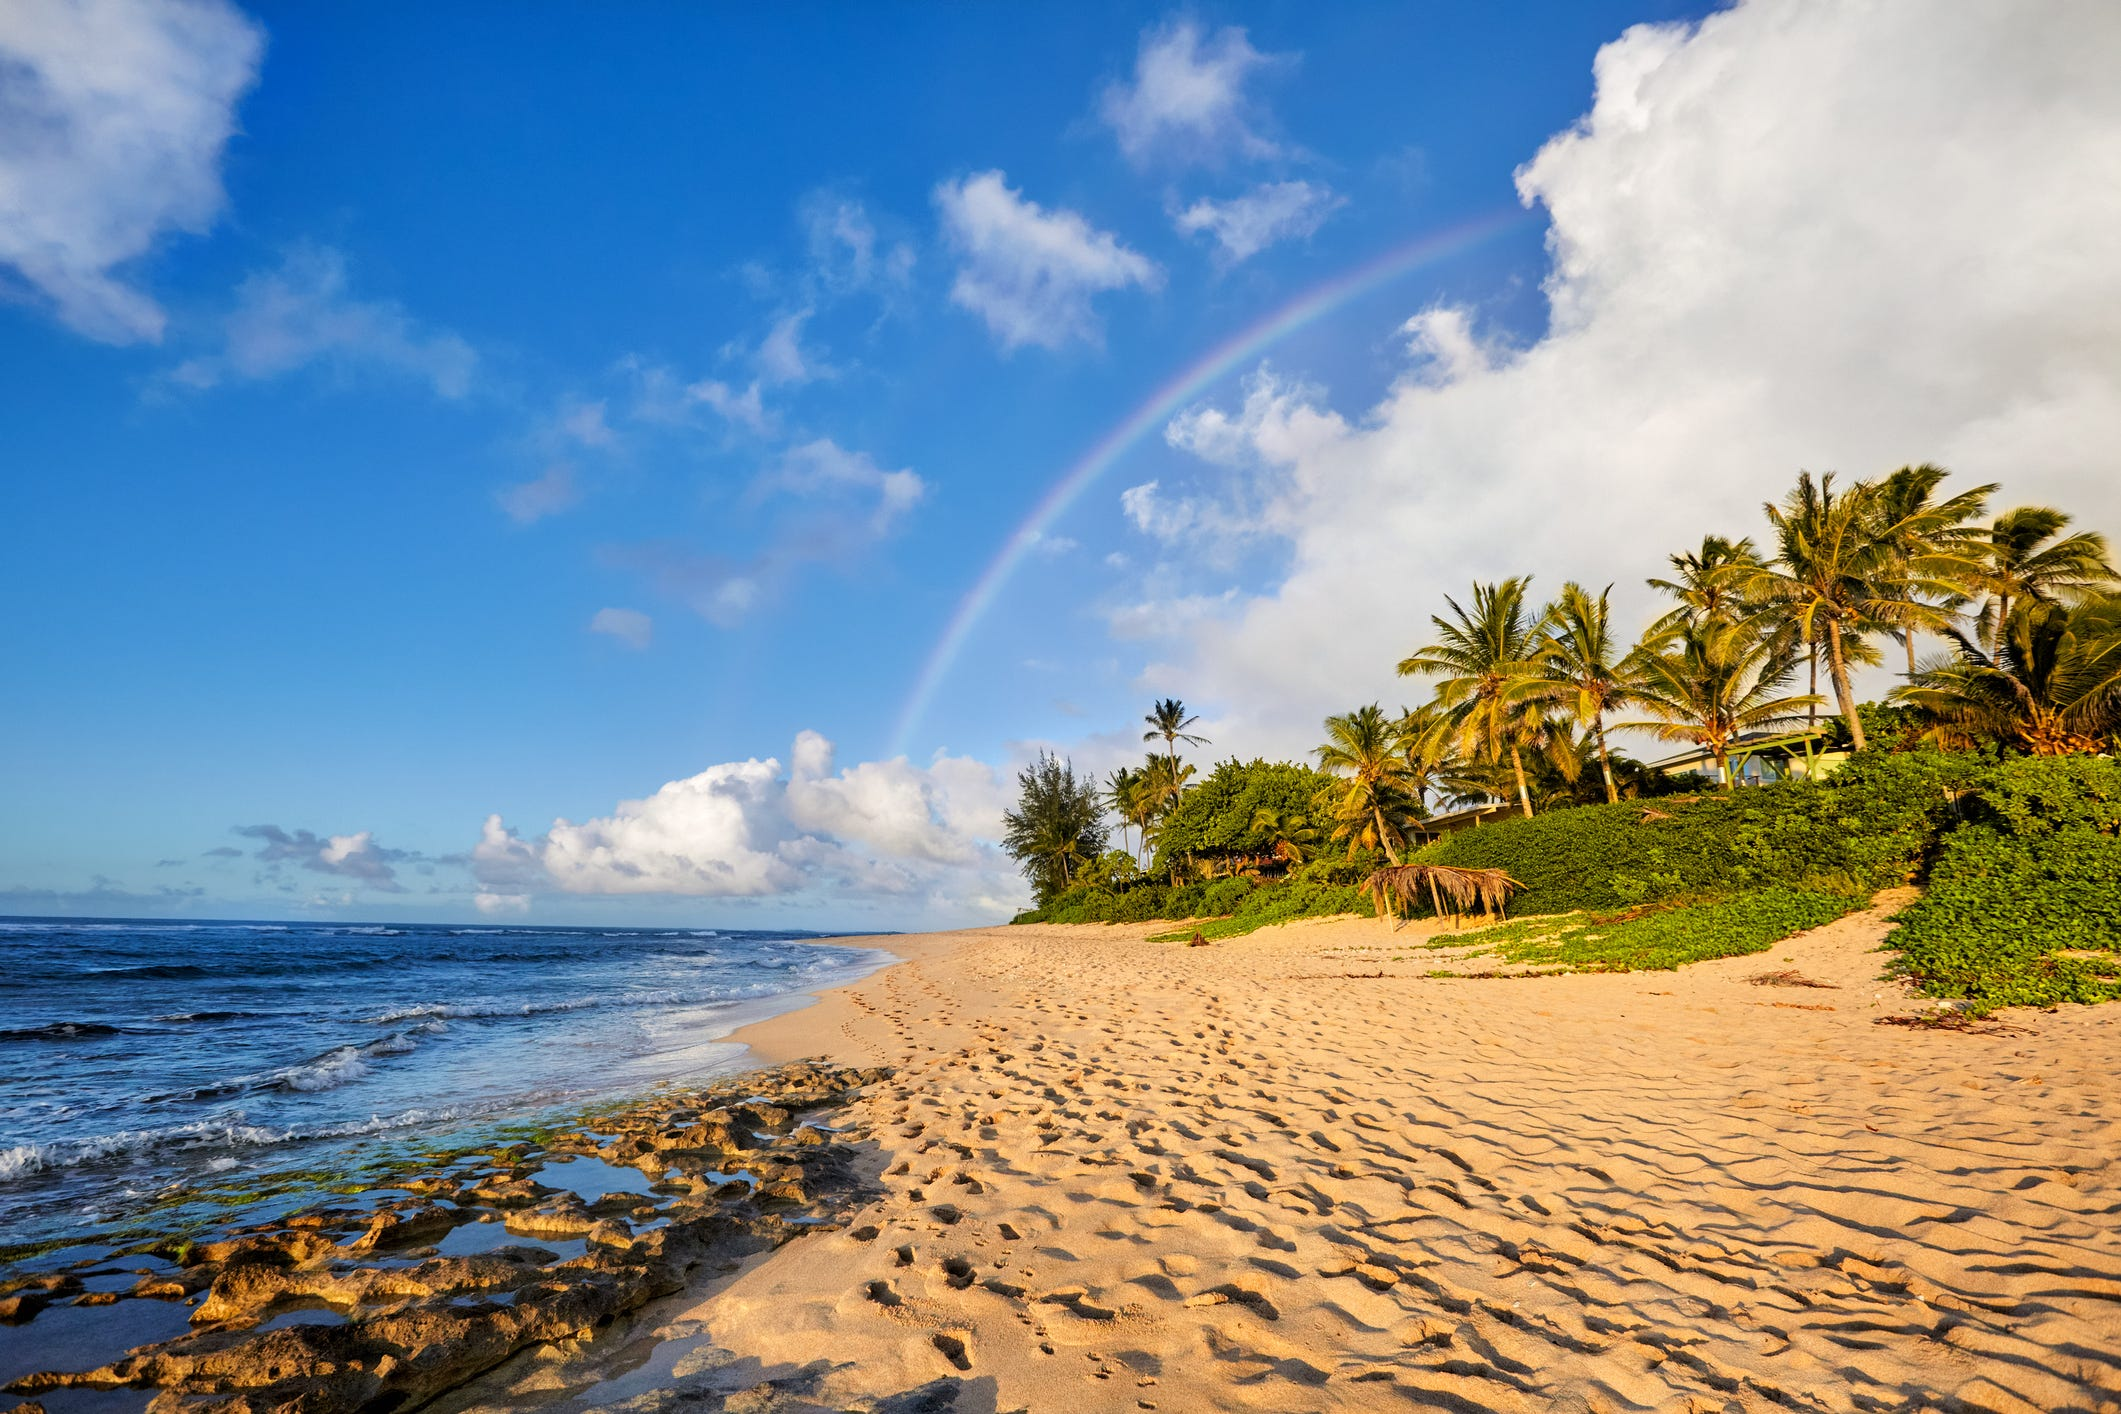 The 20 top trending U.S. beach destinations on Pinterest | USA Today